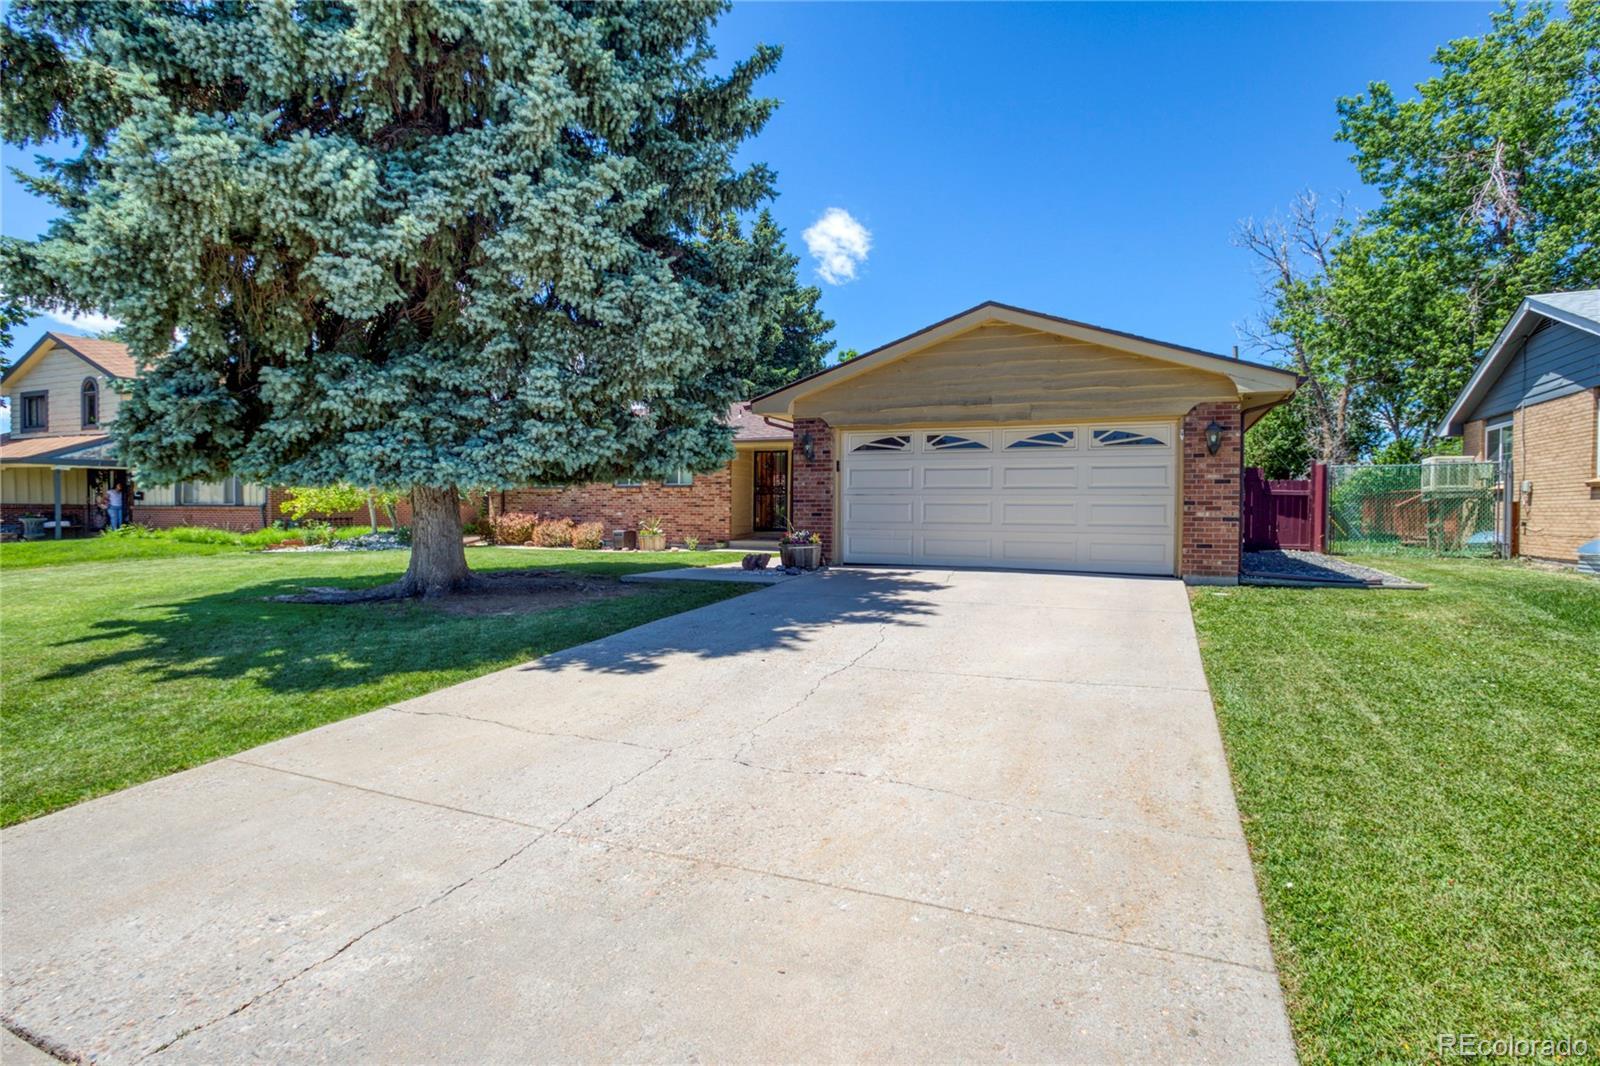 311 S Lamar Street Property Photo - Lakewood, CO real estate listing